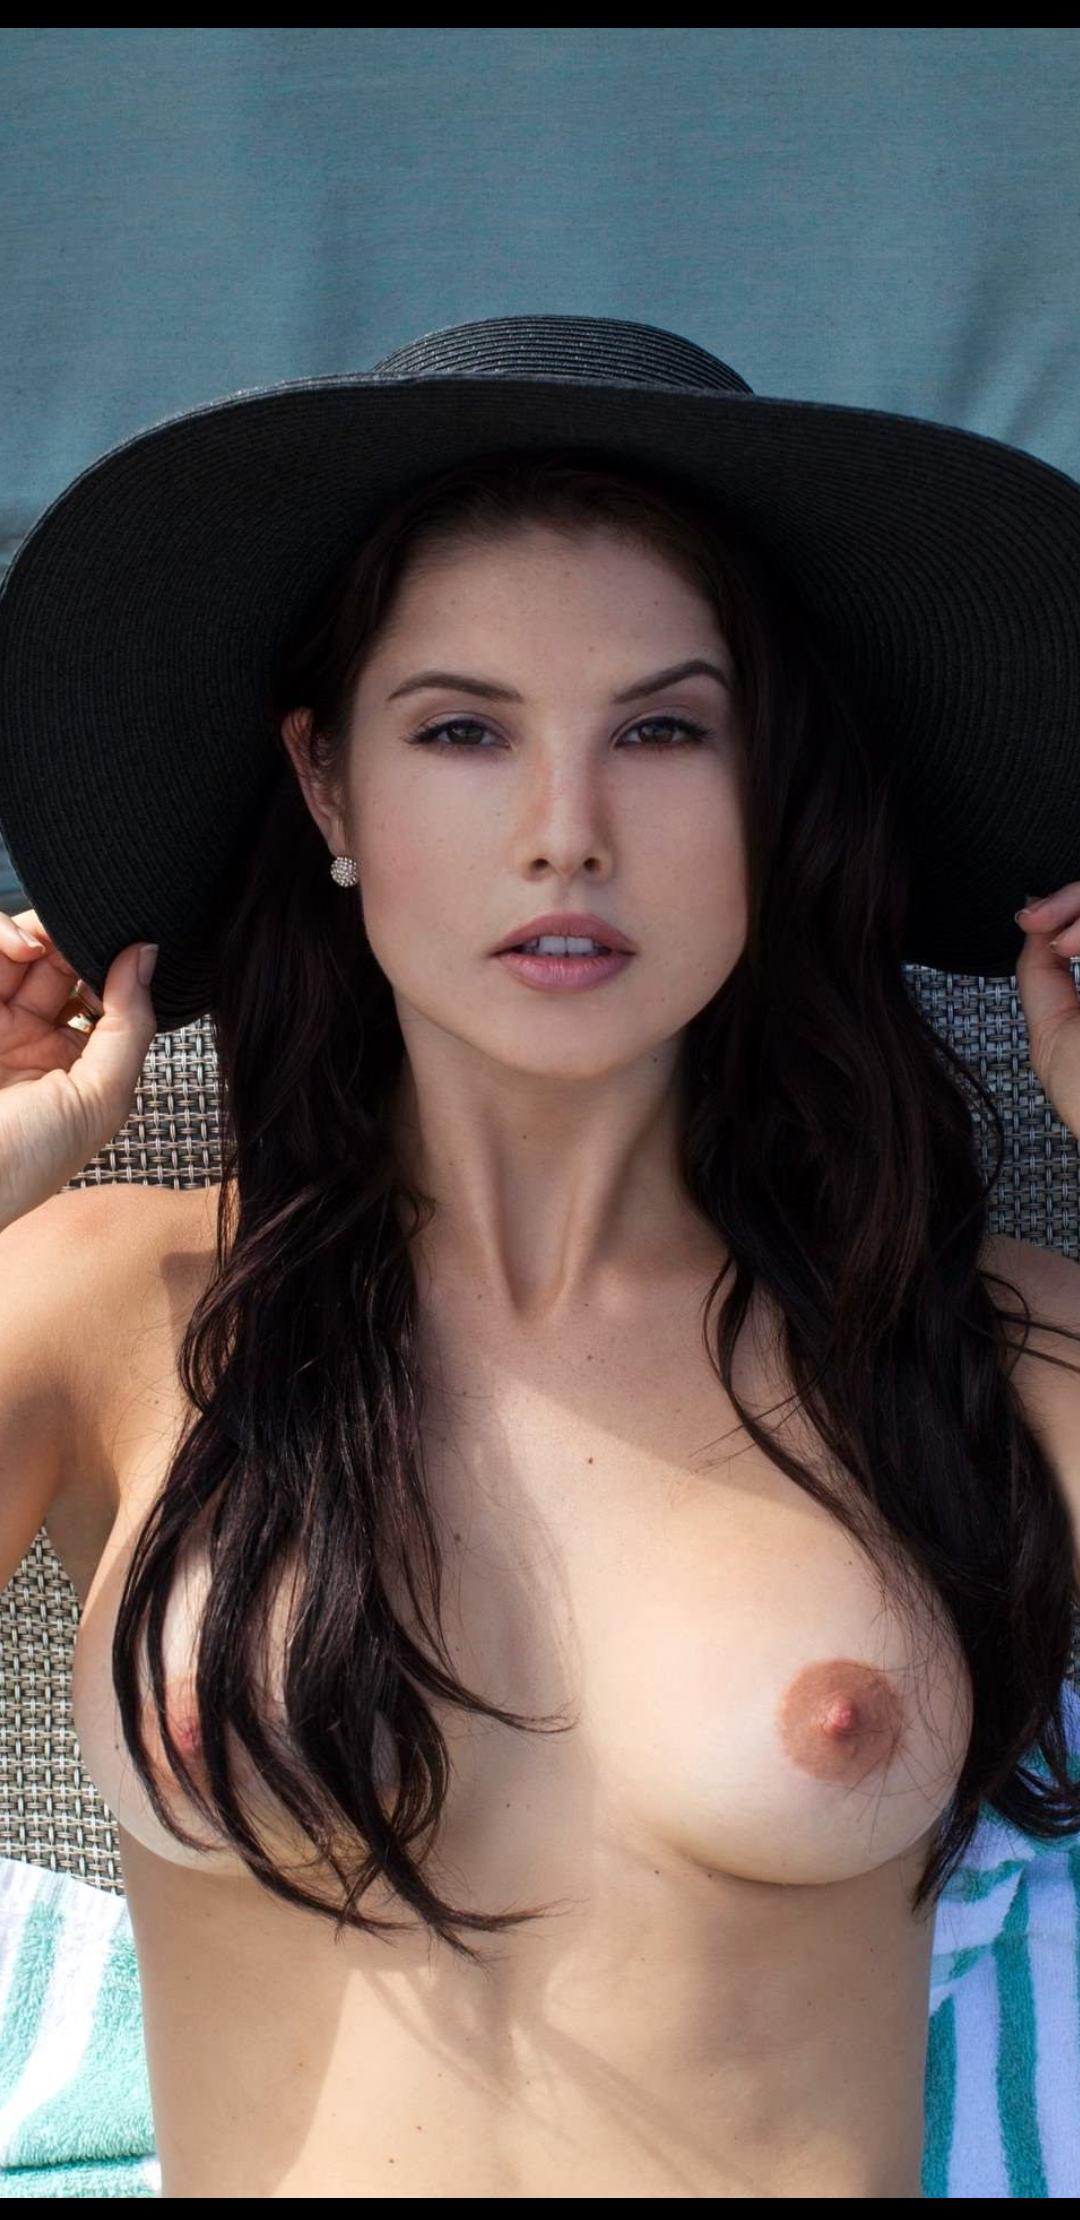 Amanda Cernys Boobs : amanda, cernys, boobs, Amanda, Cerny, Before, XPorn18xxx